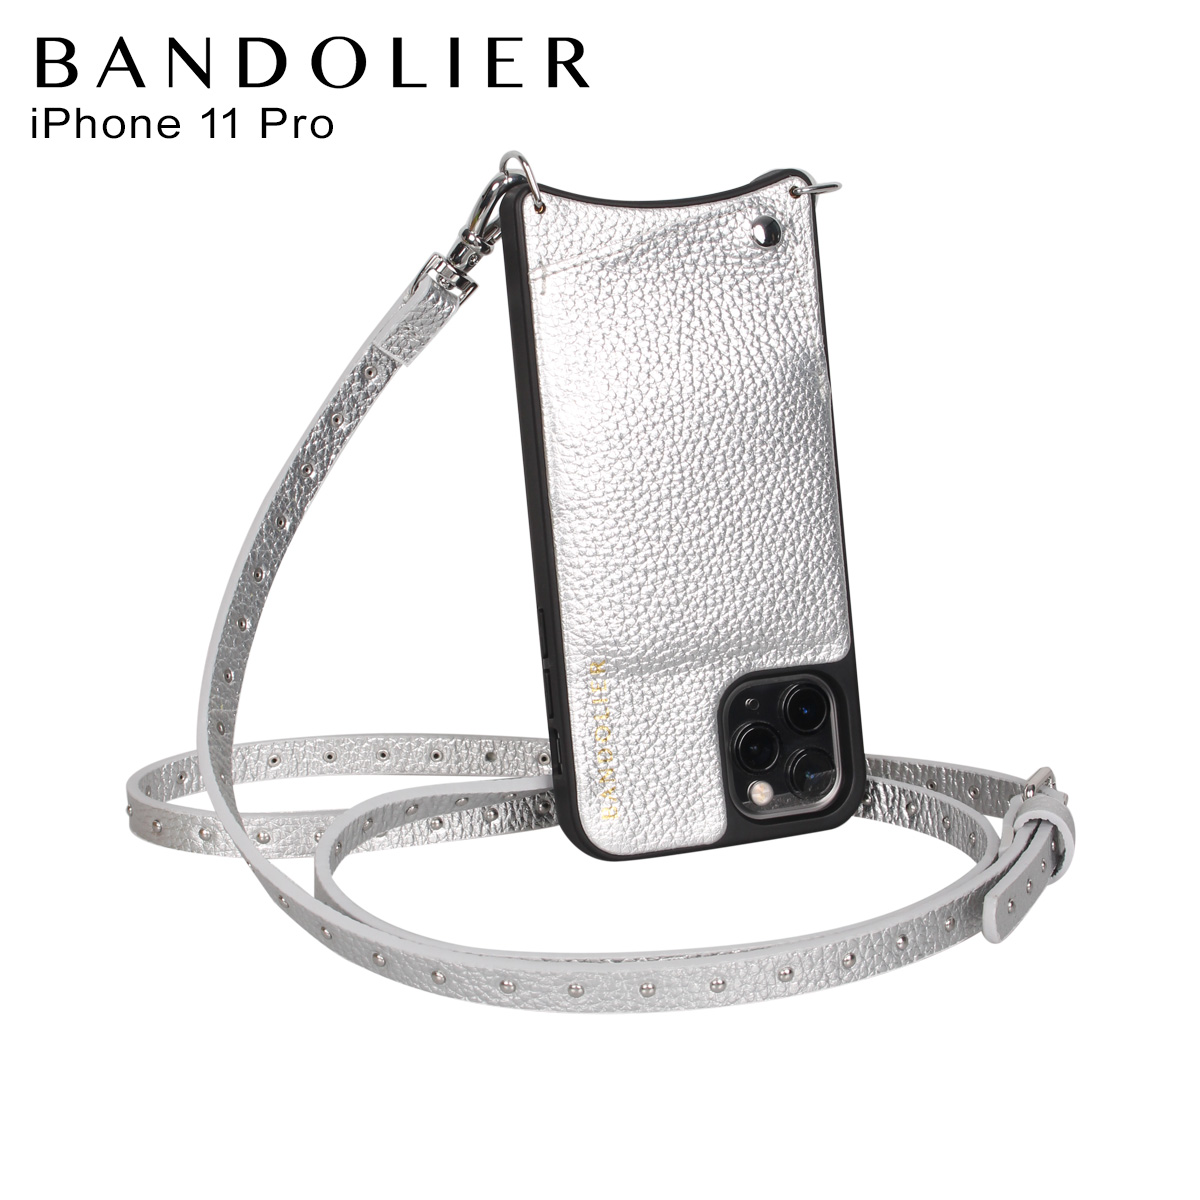 BANDOLIER バンドリヤー iPhone11 Proケース スマホ 携帯 ショルダー アイフォン メンズ レディース レザー NICOLE RICH SILVER シルバー 10NIC